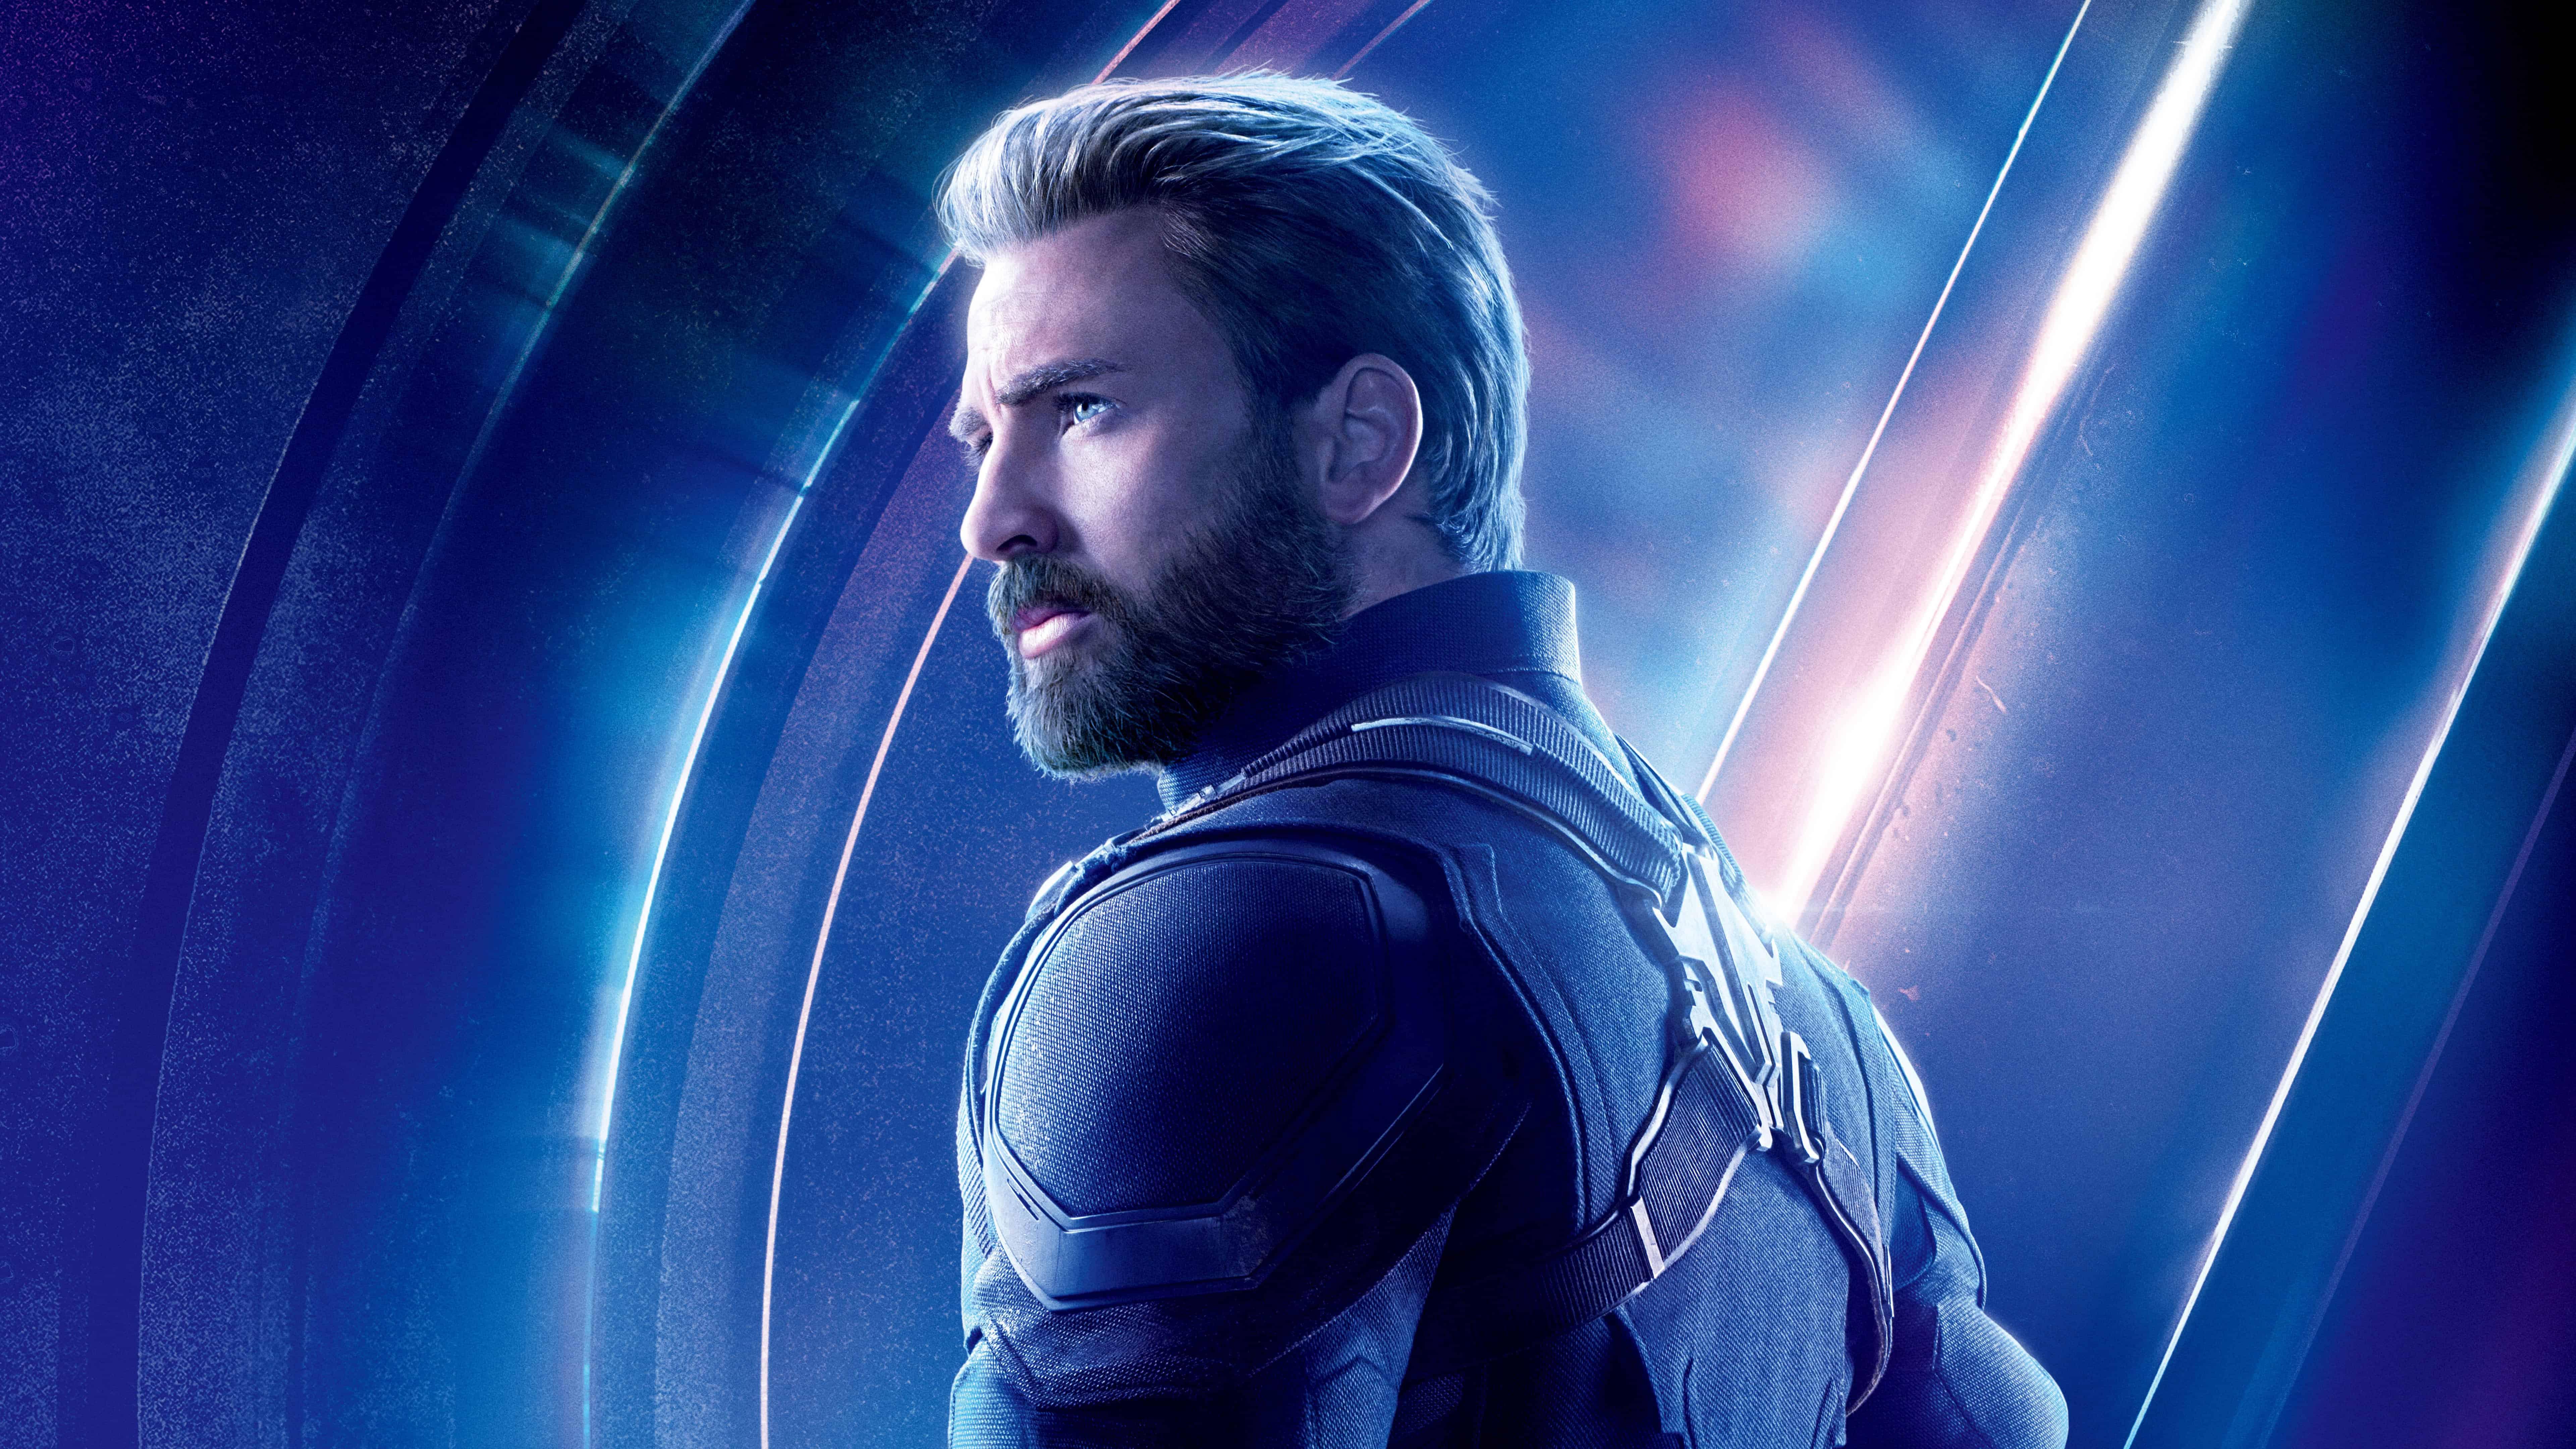 Avengers Infinity War Captain America UHD 8K Wallpaper Pixelz 7680x4320